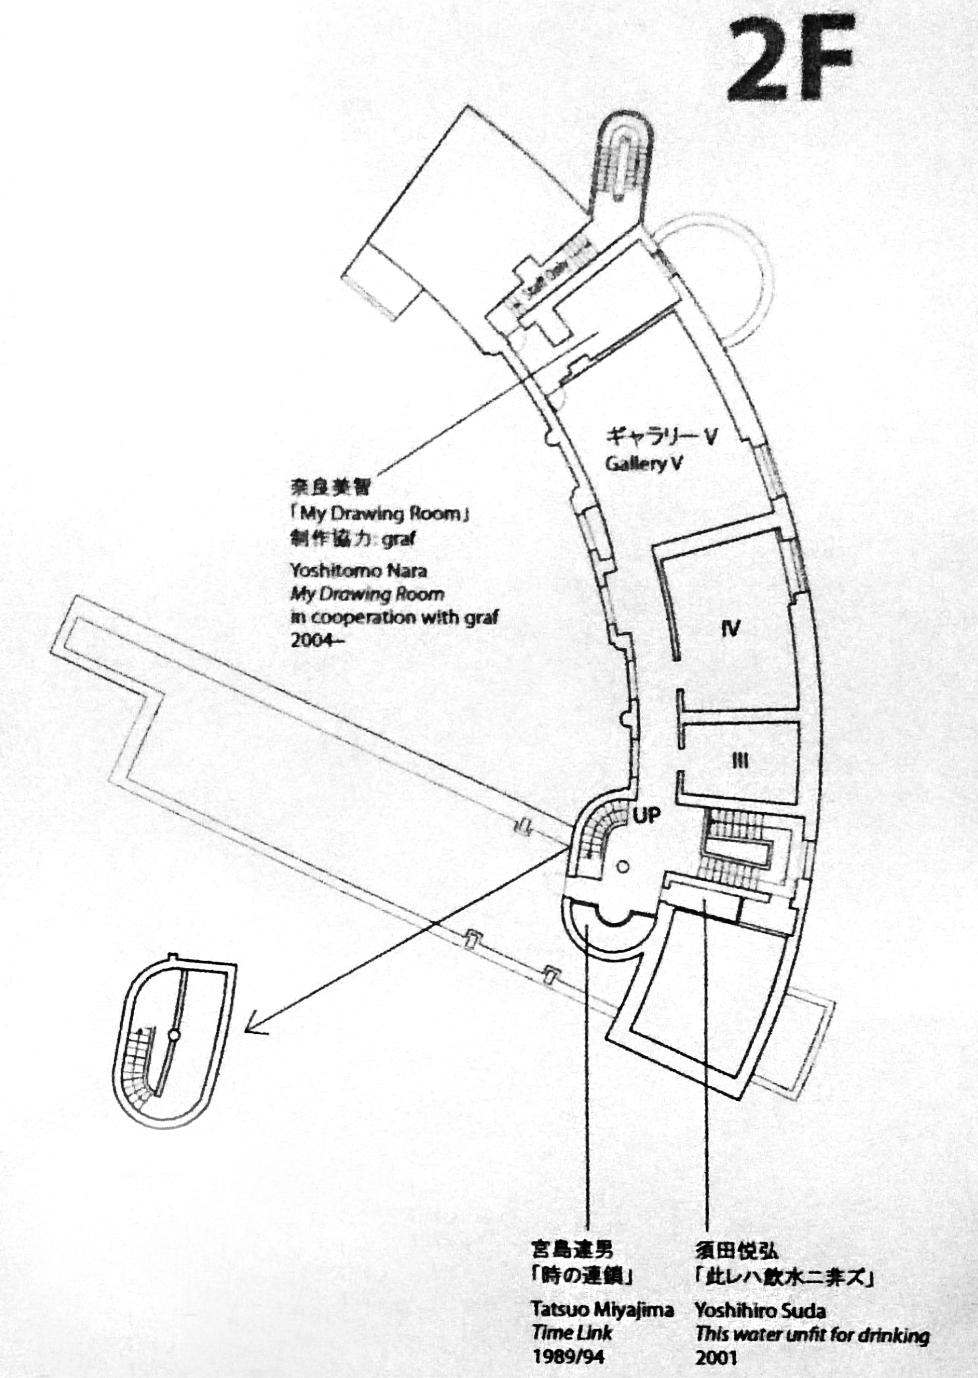 1938 – Hara Museum of Contemporary Art